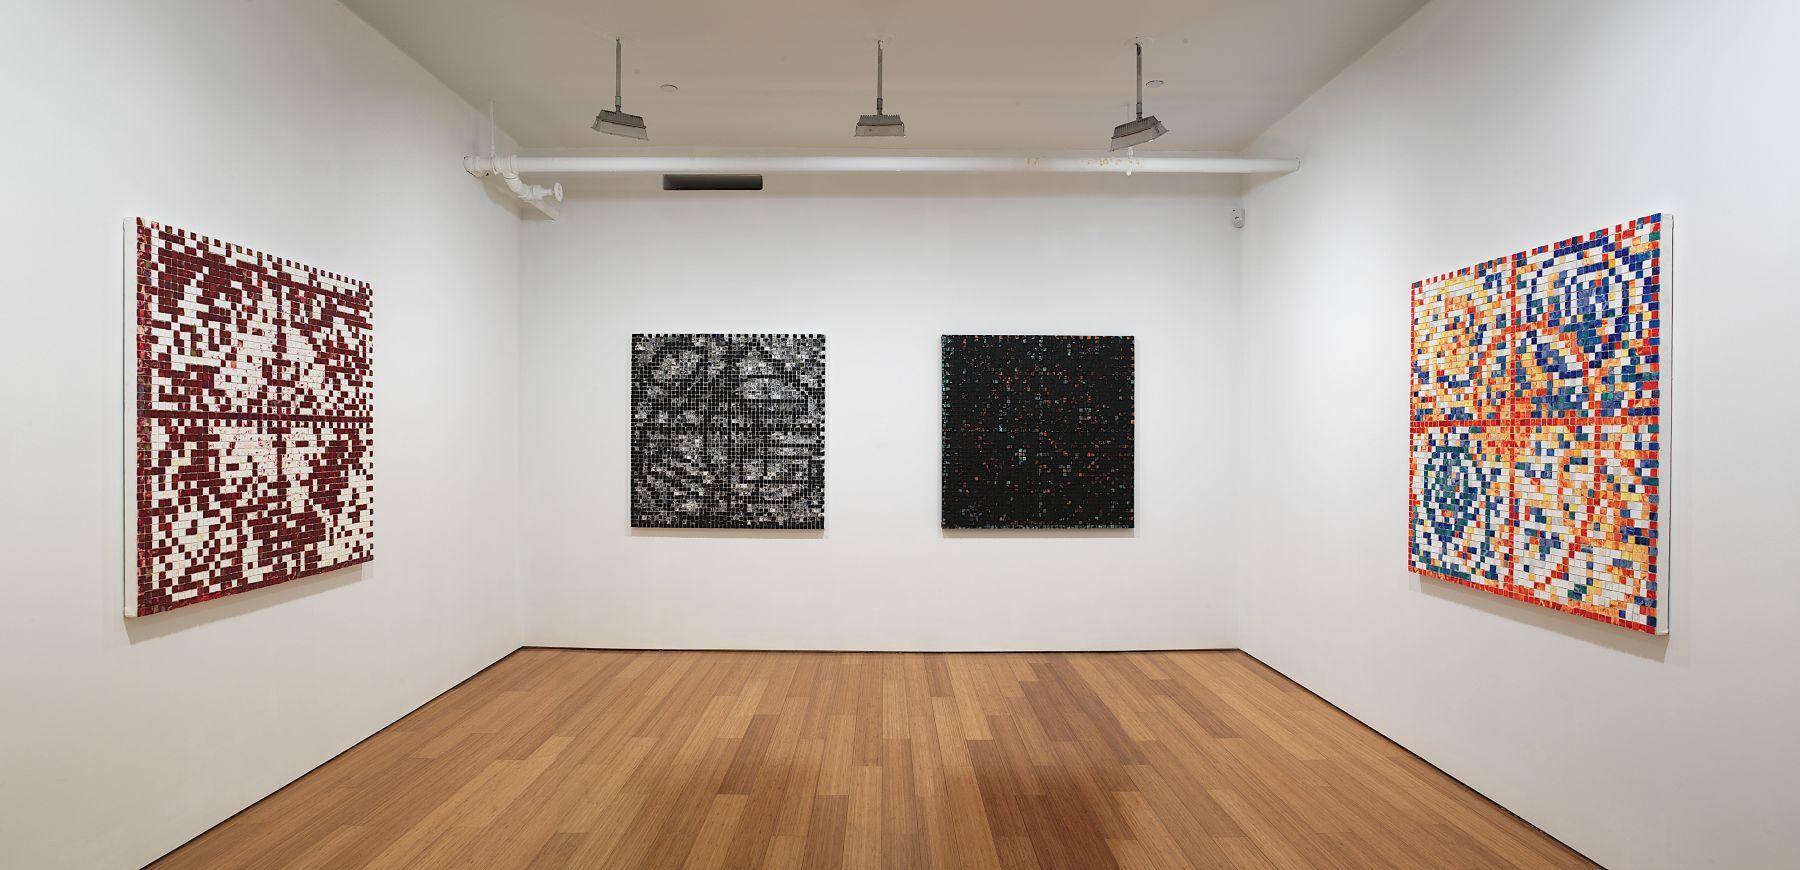 Jack Whitten,Installation view, Alexander Gray Associates, 2007